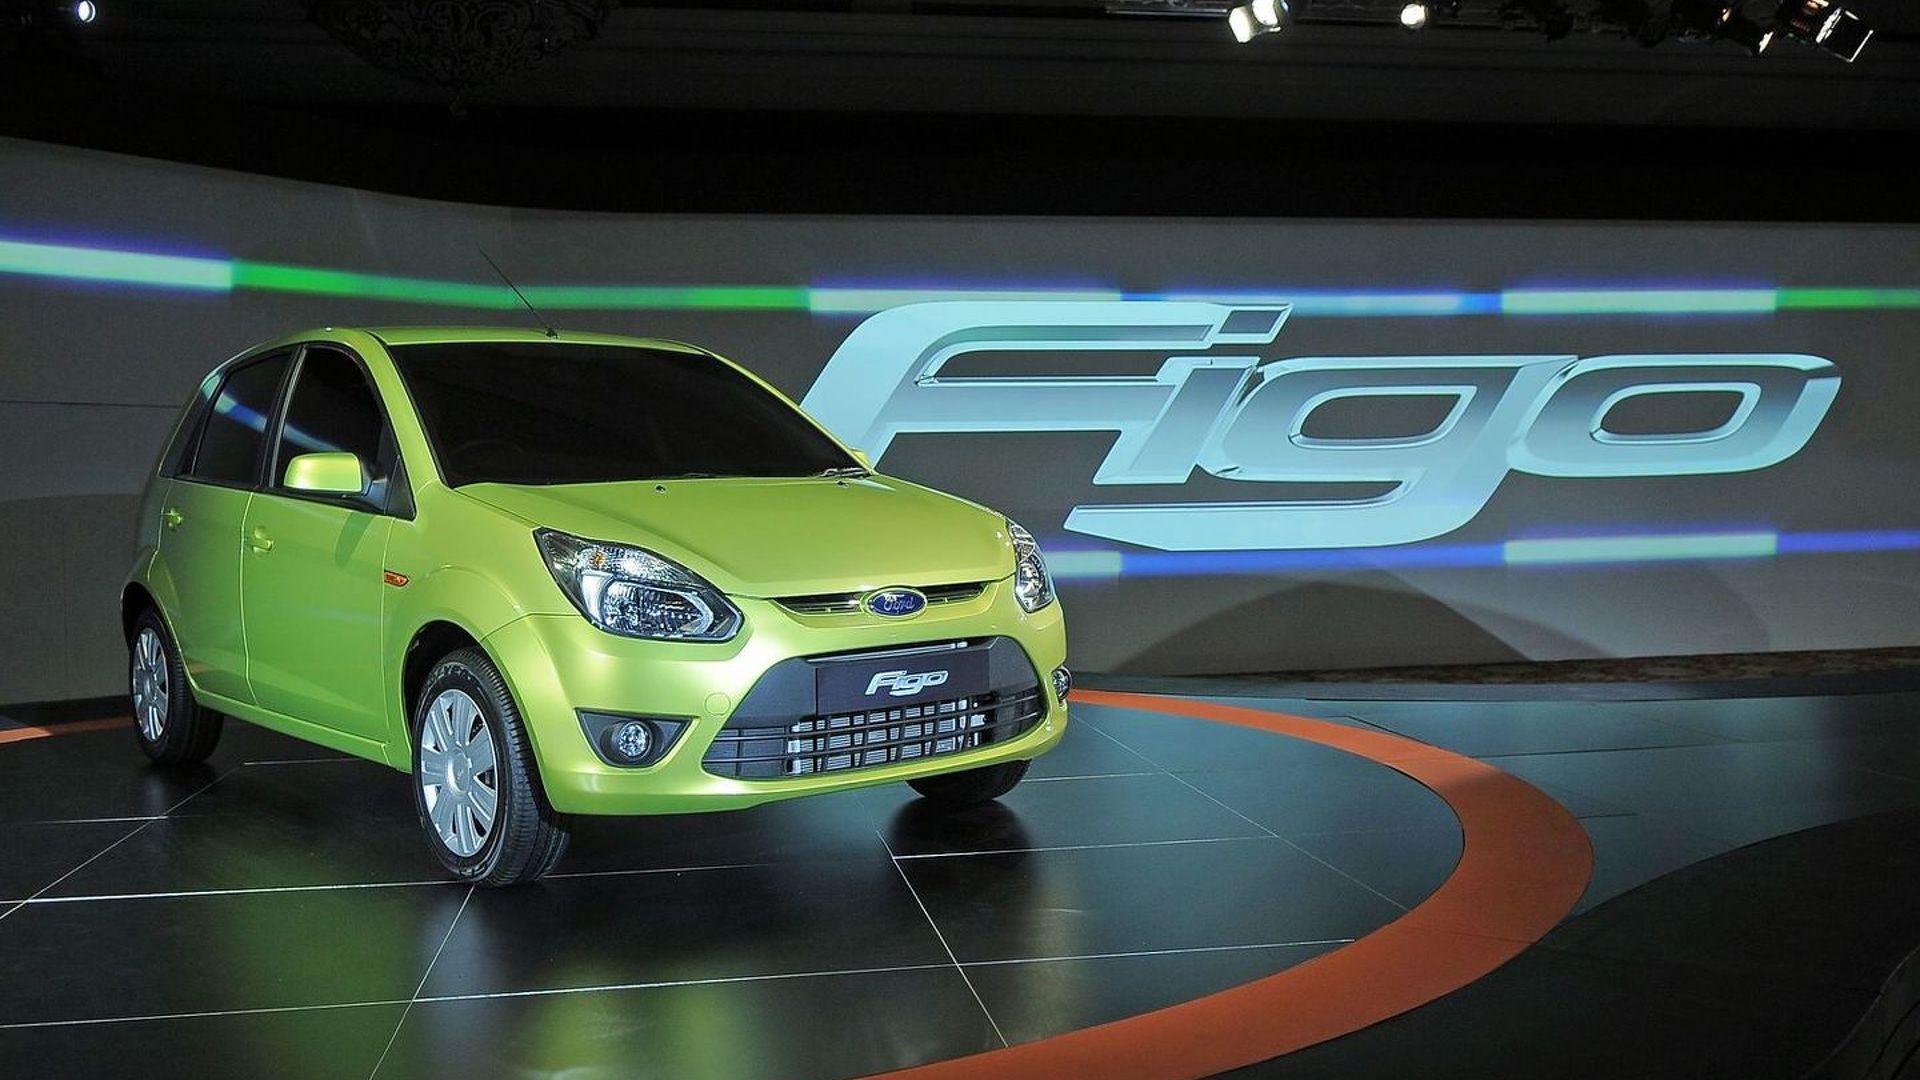 2010 Ford Figo Revealed in India